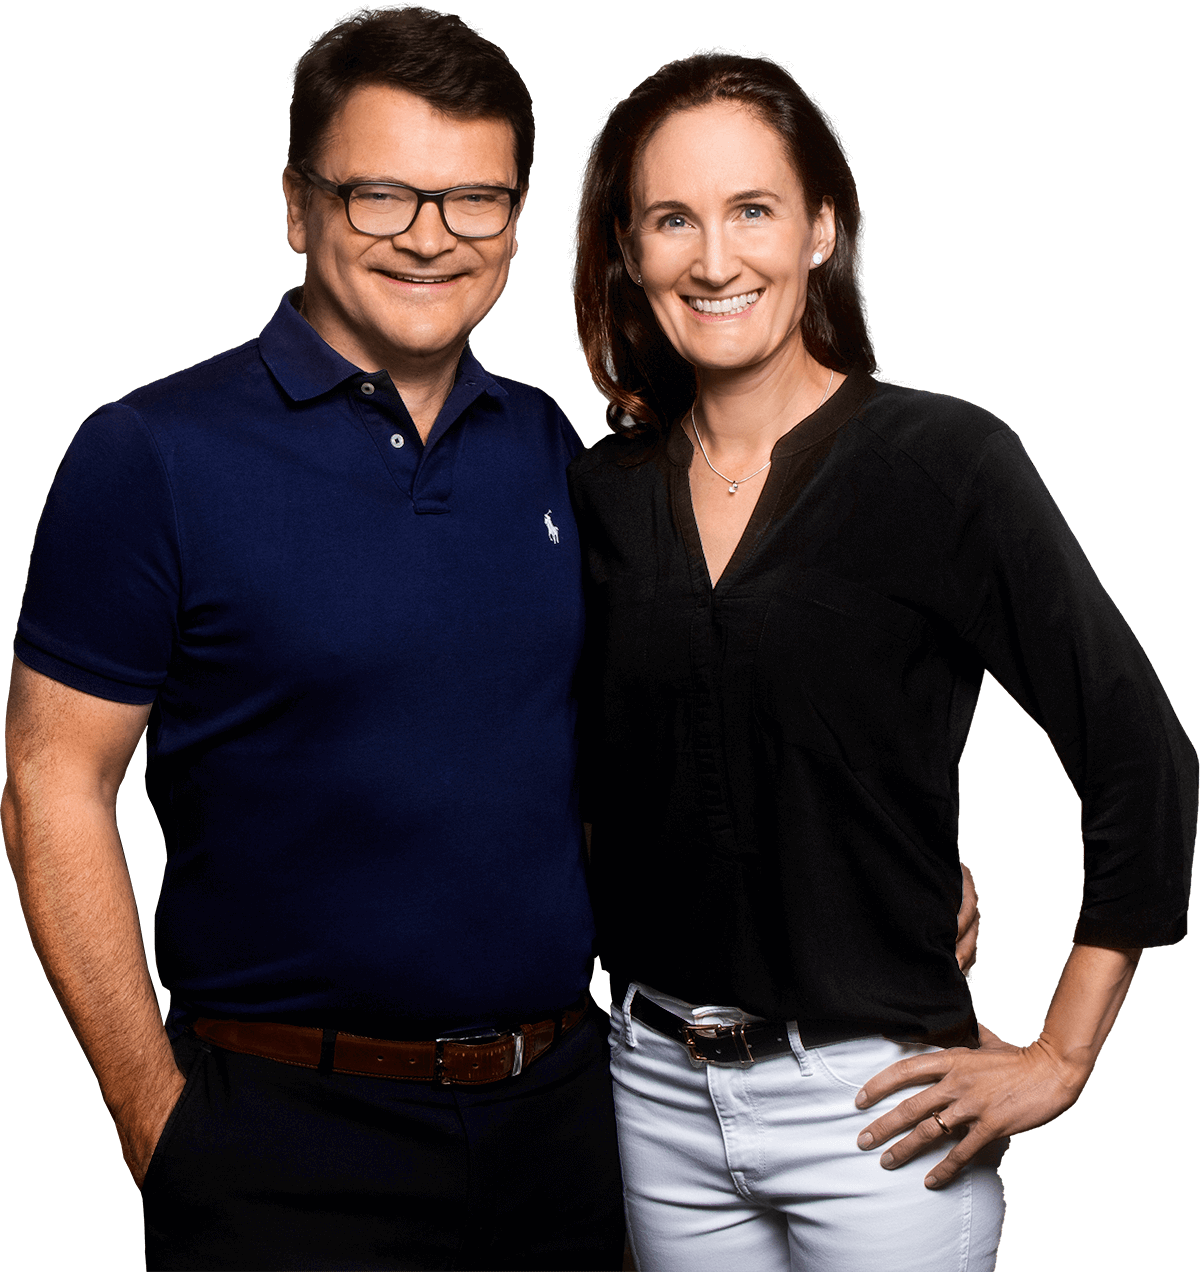 Das perfekte Coaching Business aufbauen Christian Mugrauer Yvonne